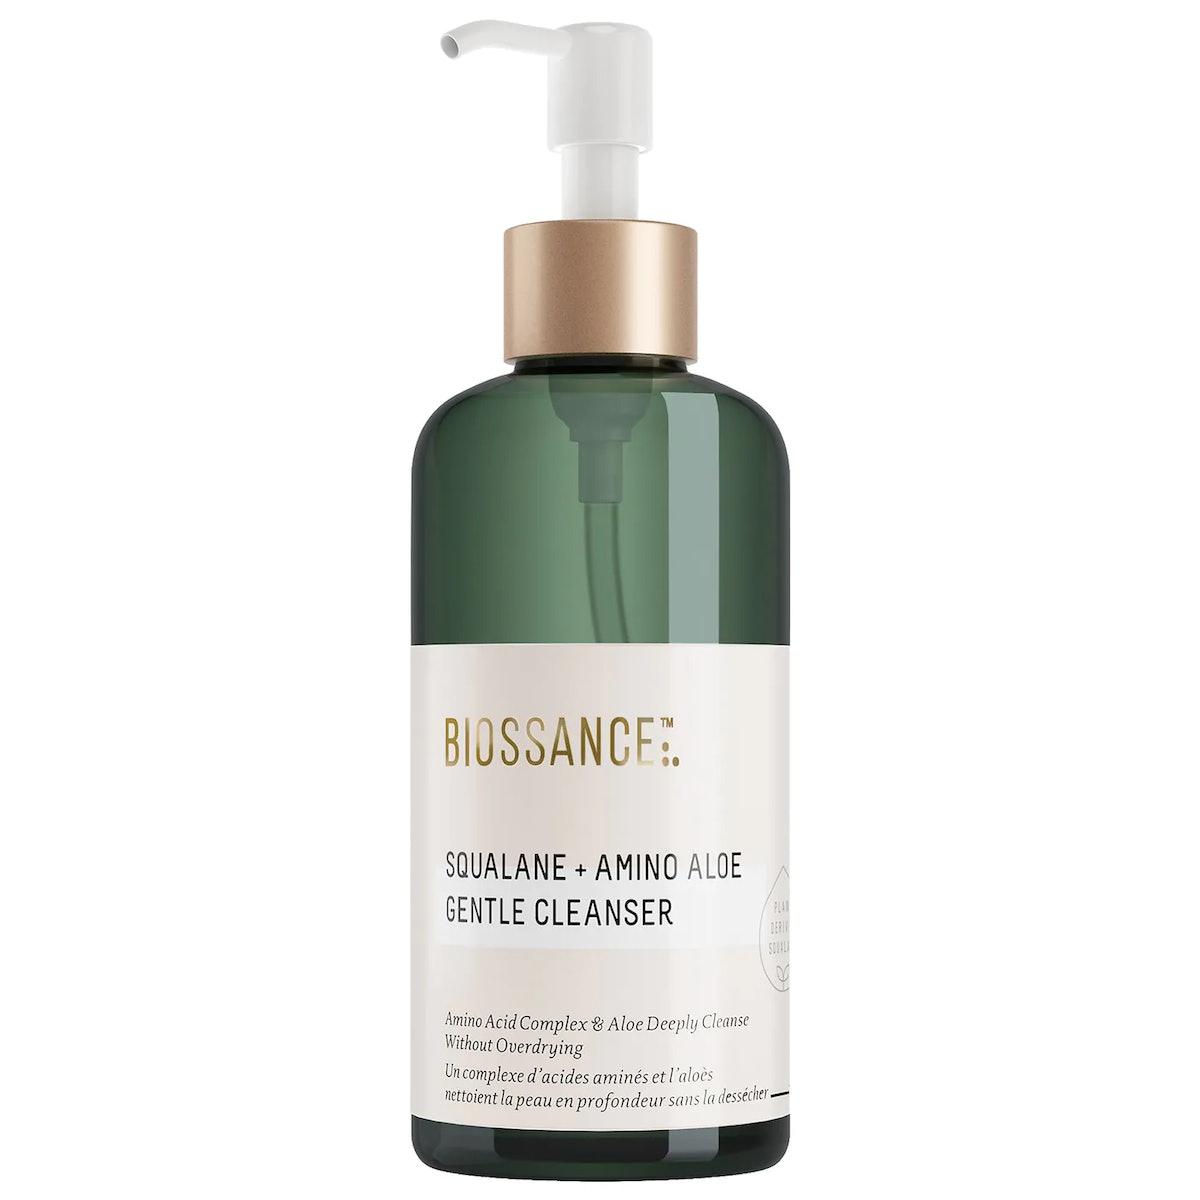 Squalane + Amino Aloe Gentle Cleanser